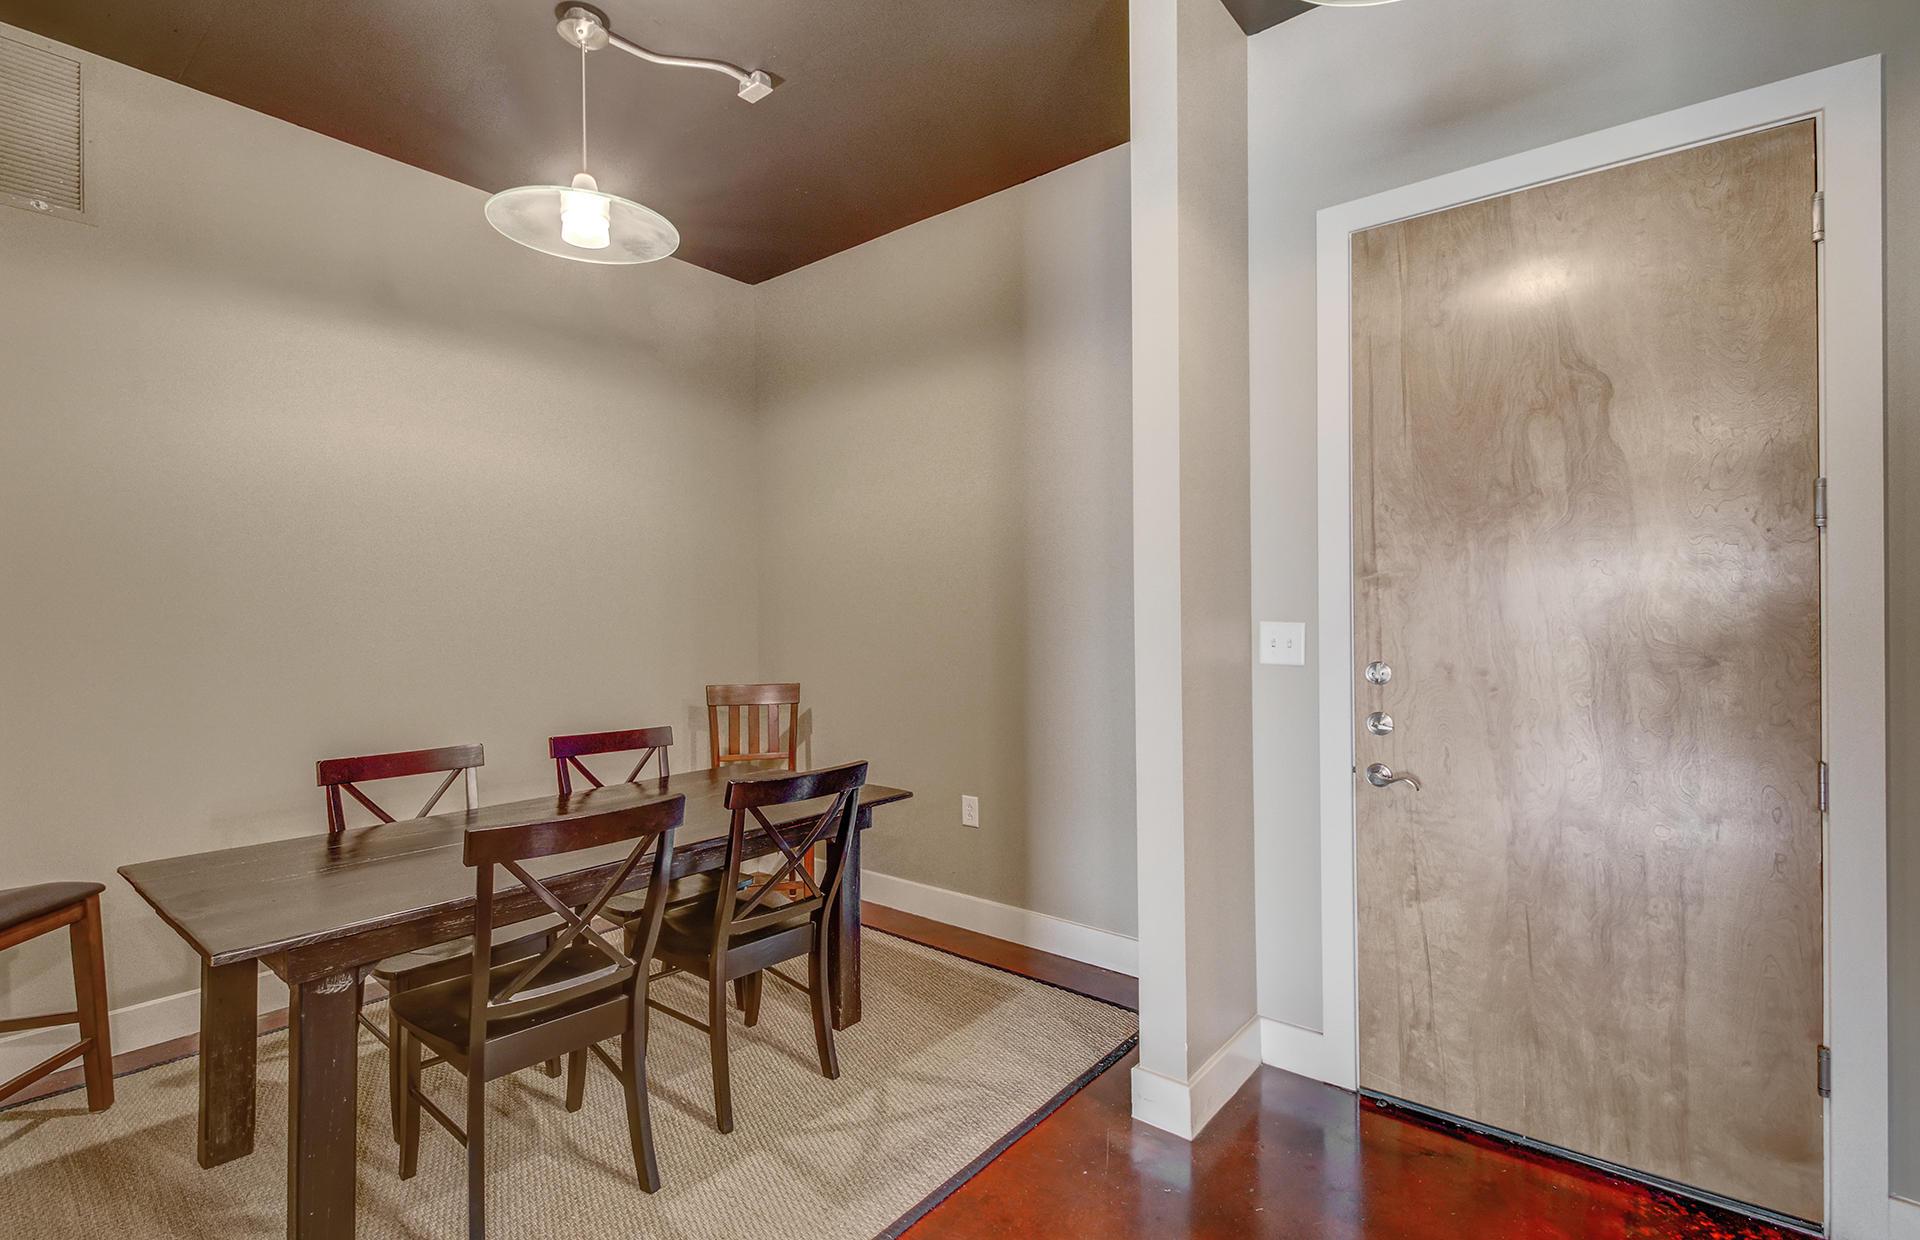 Bee Street Lofts Homes For Sale - 150 Bee, Charleston, SC - 8